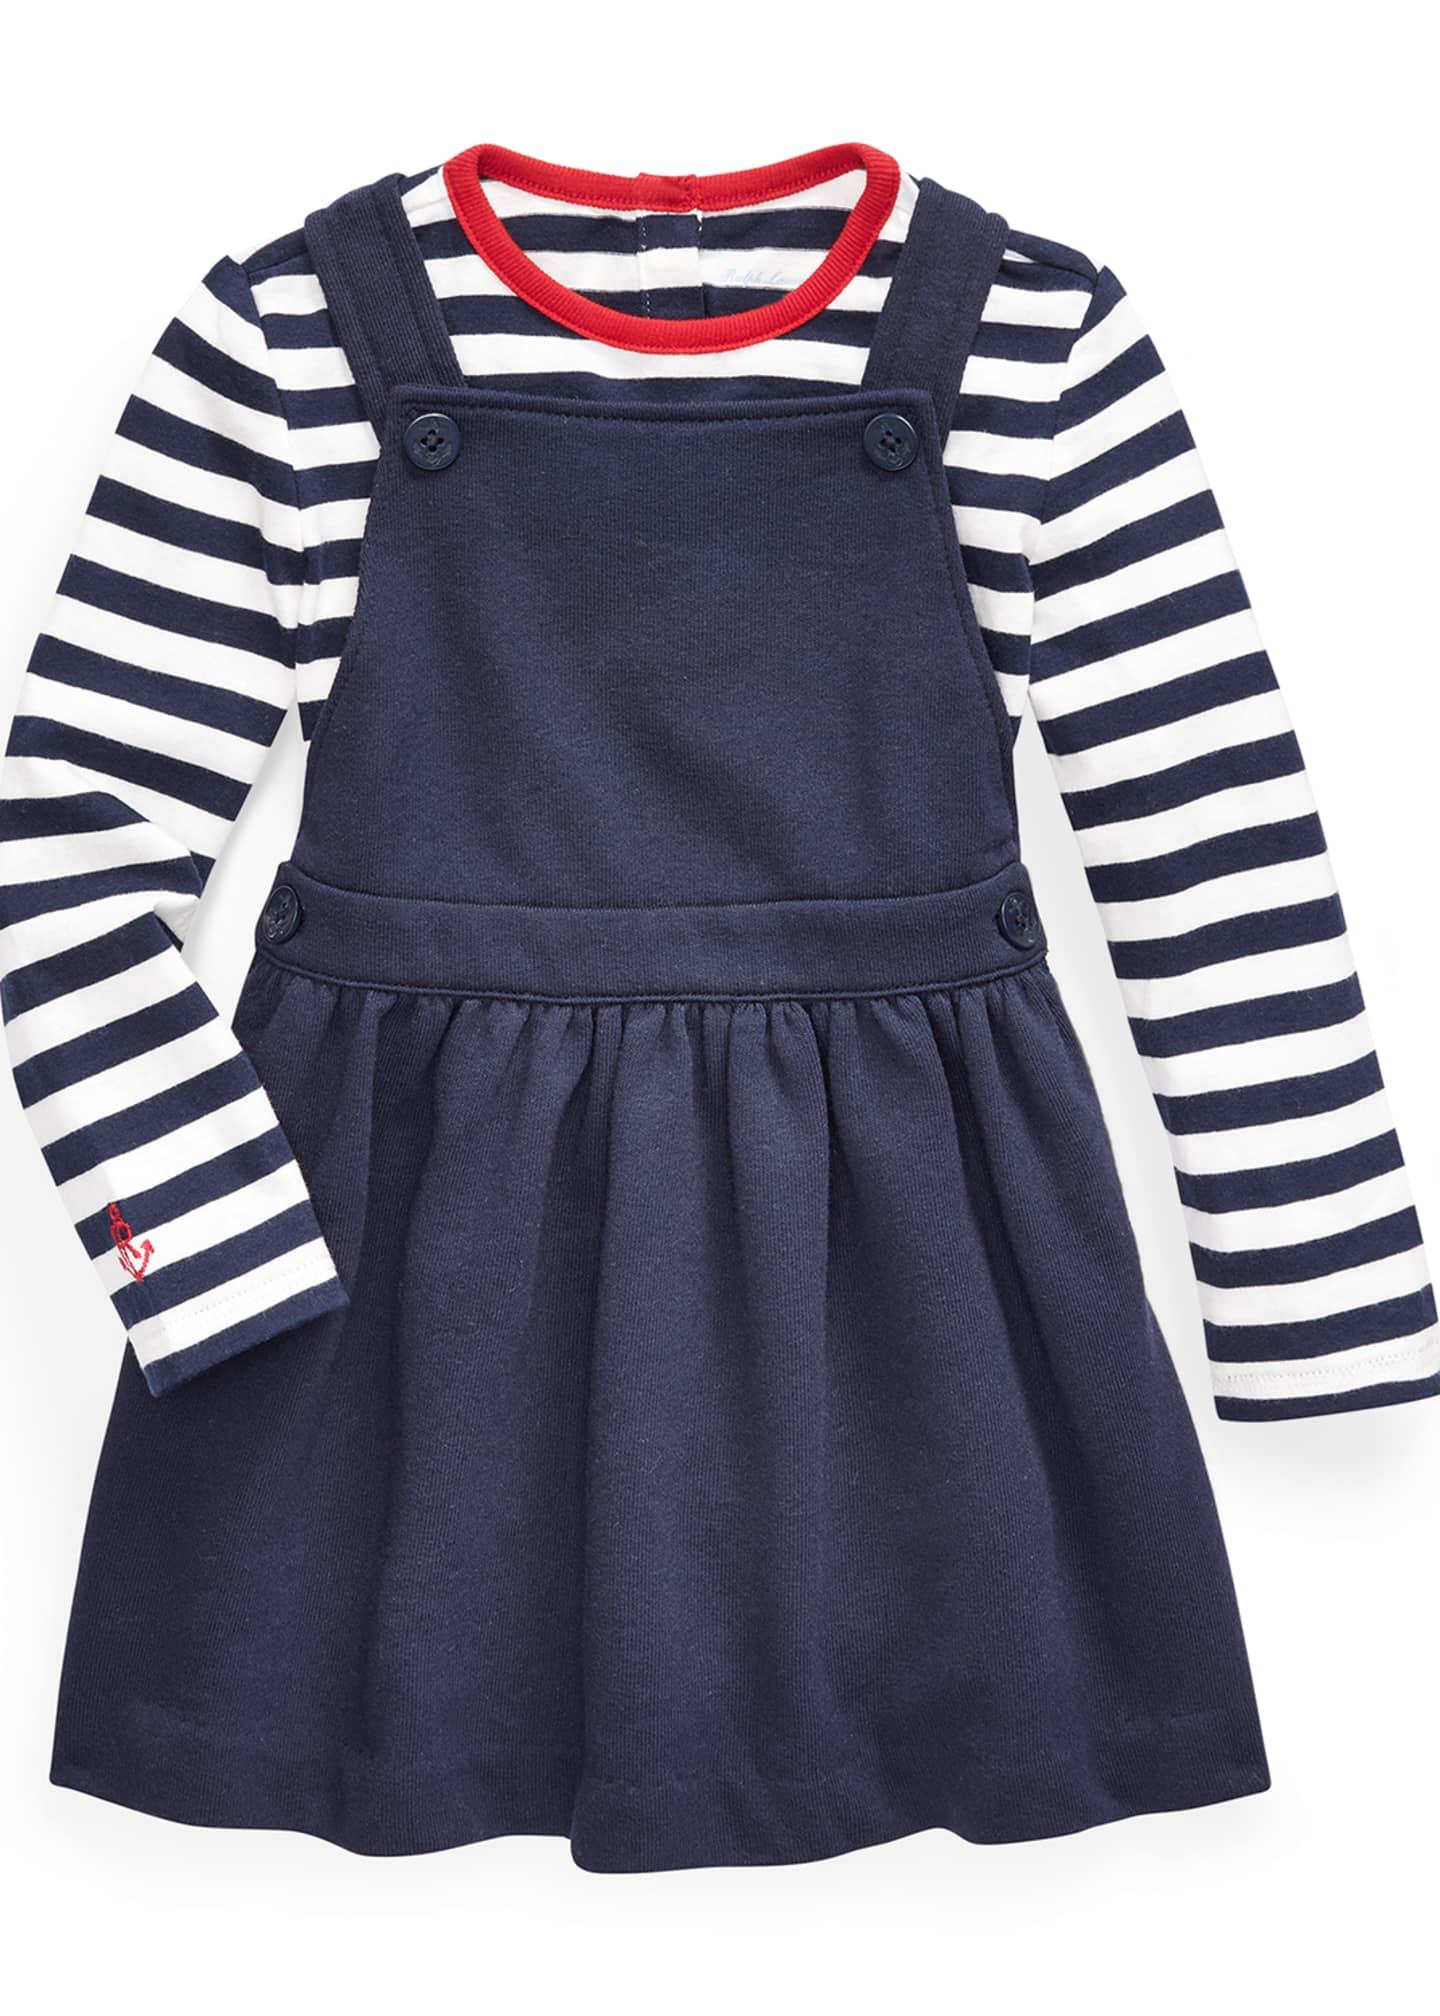 Ralph Lauren Childrenswear Girl's French Terry Overall Dress